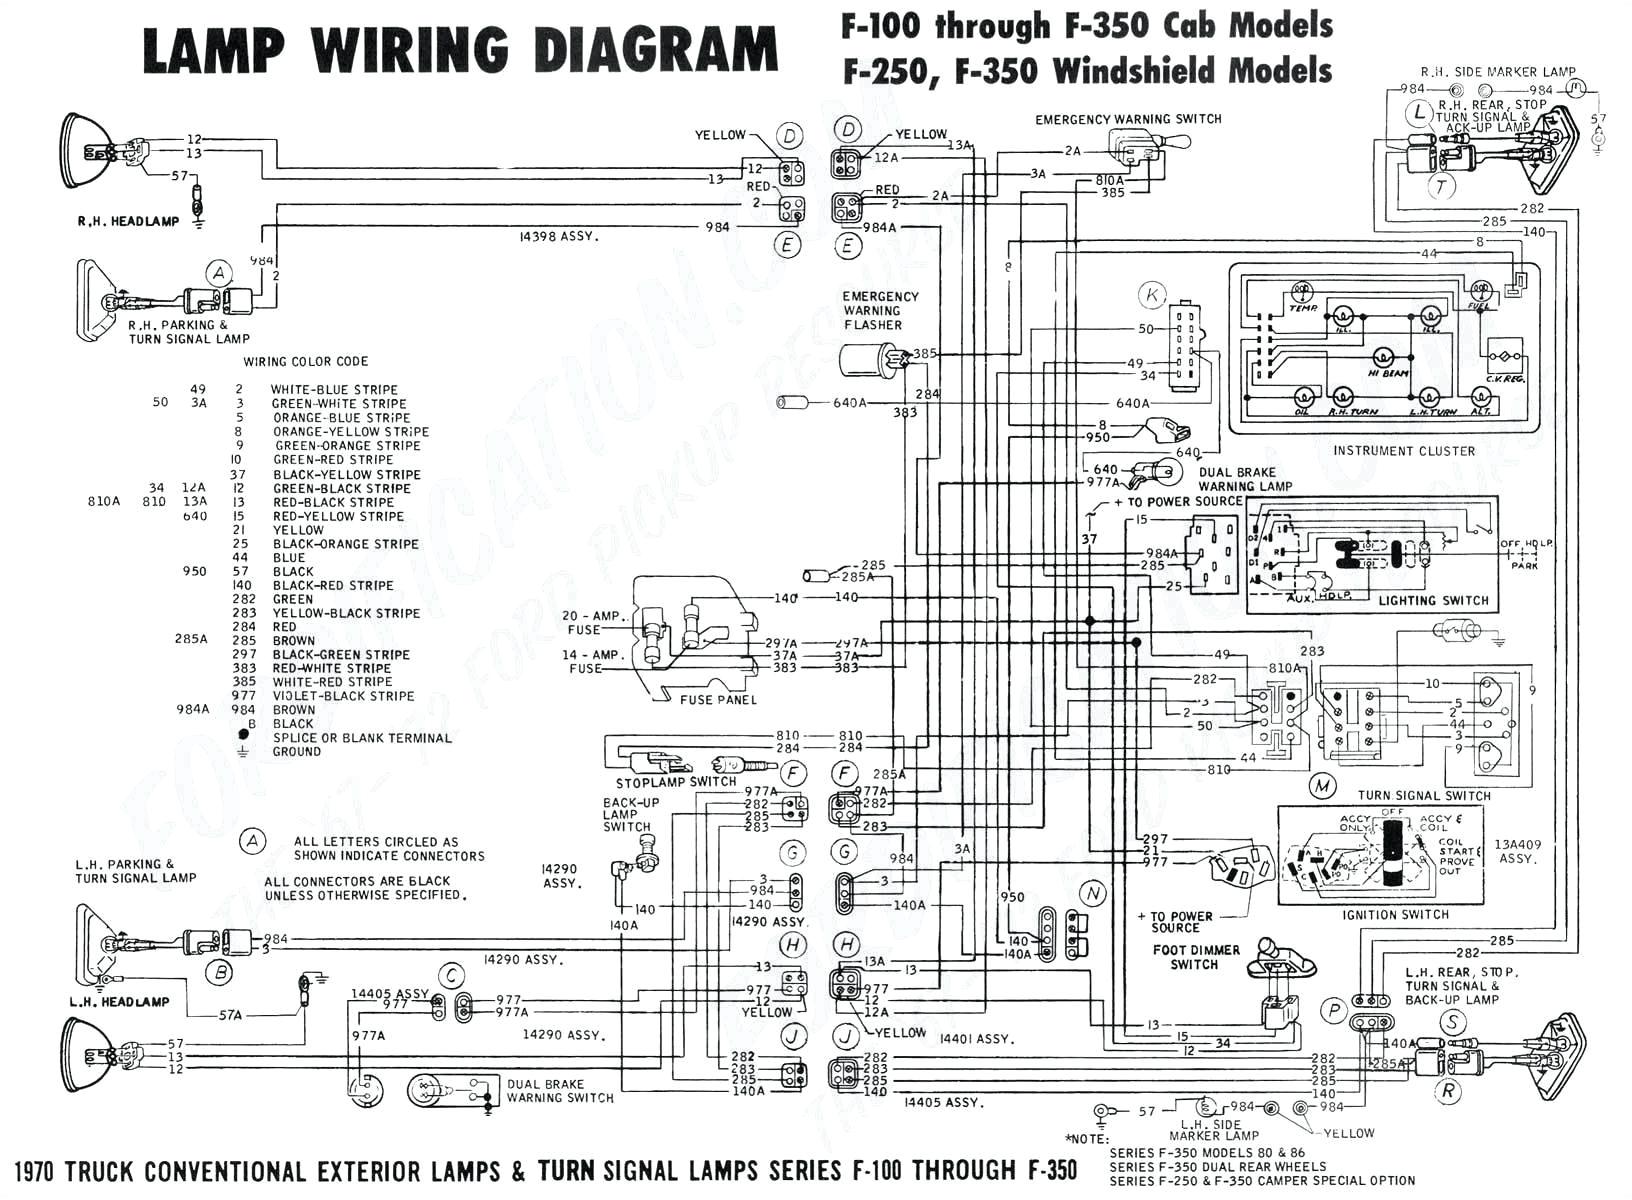 volvo l220f wiring diagrams wiring diagram datasource volvo l220f wiring diagrams